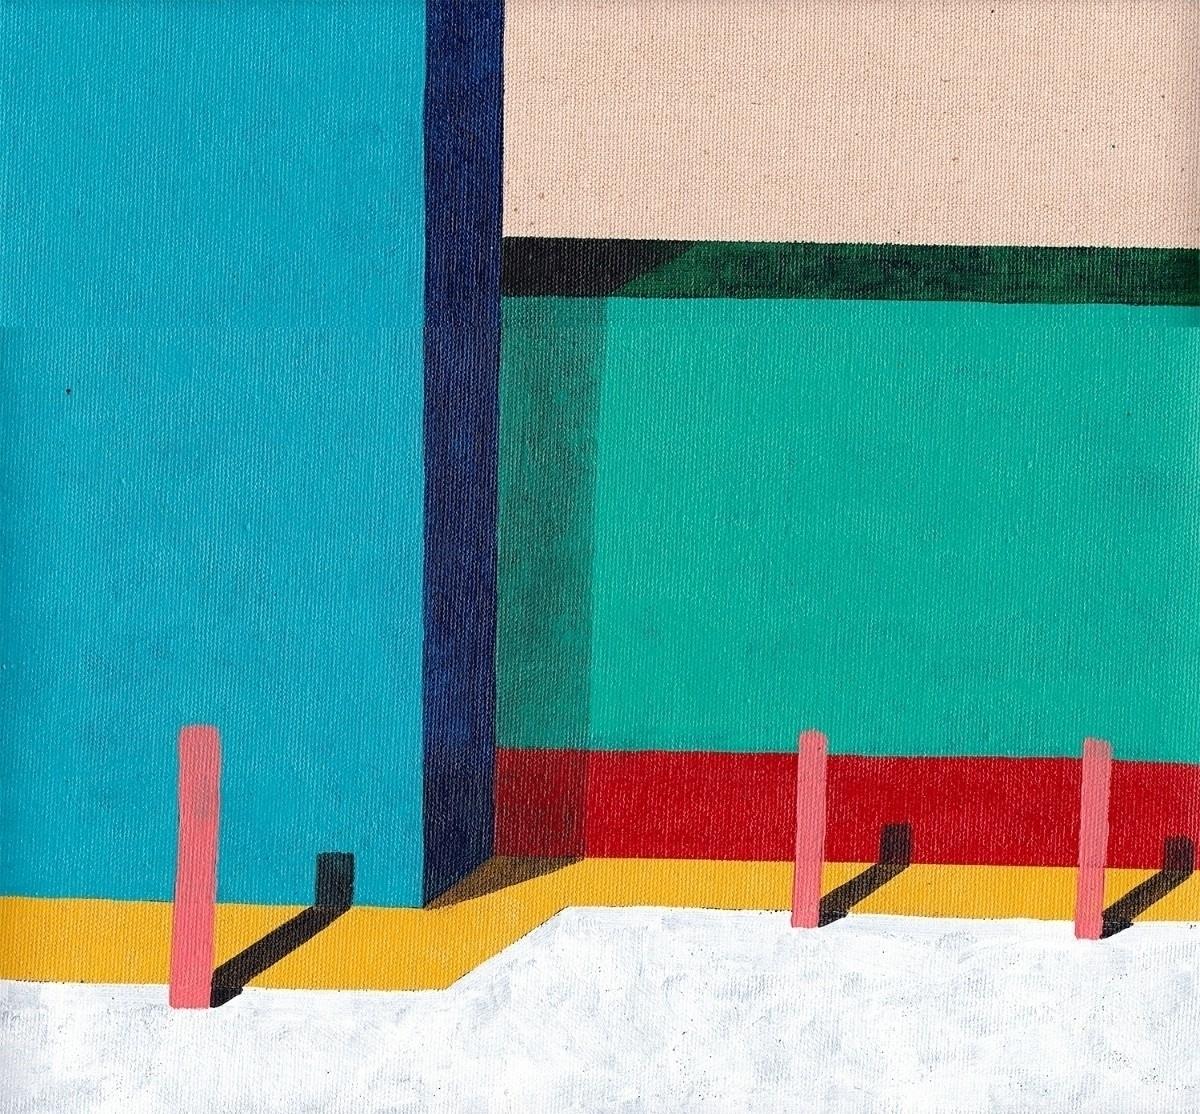 York St - art, minimal, modern, painting - davidmesquivel | ello